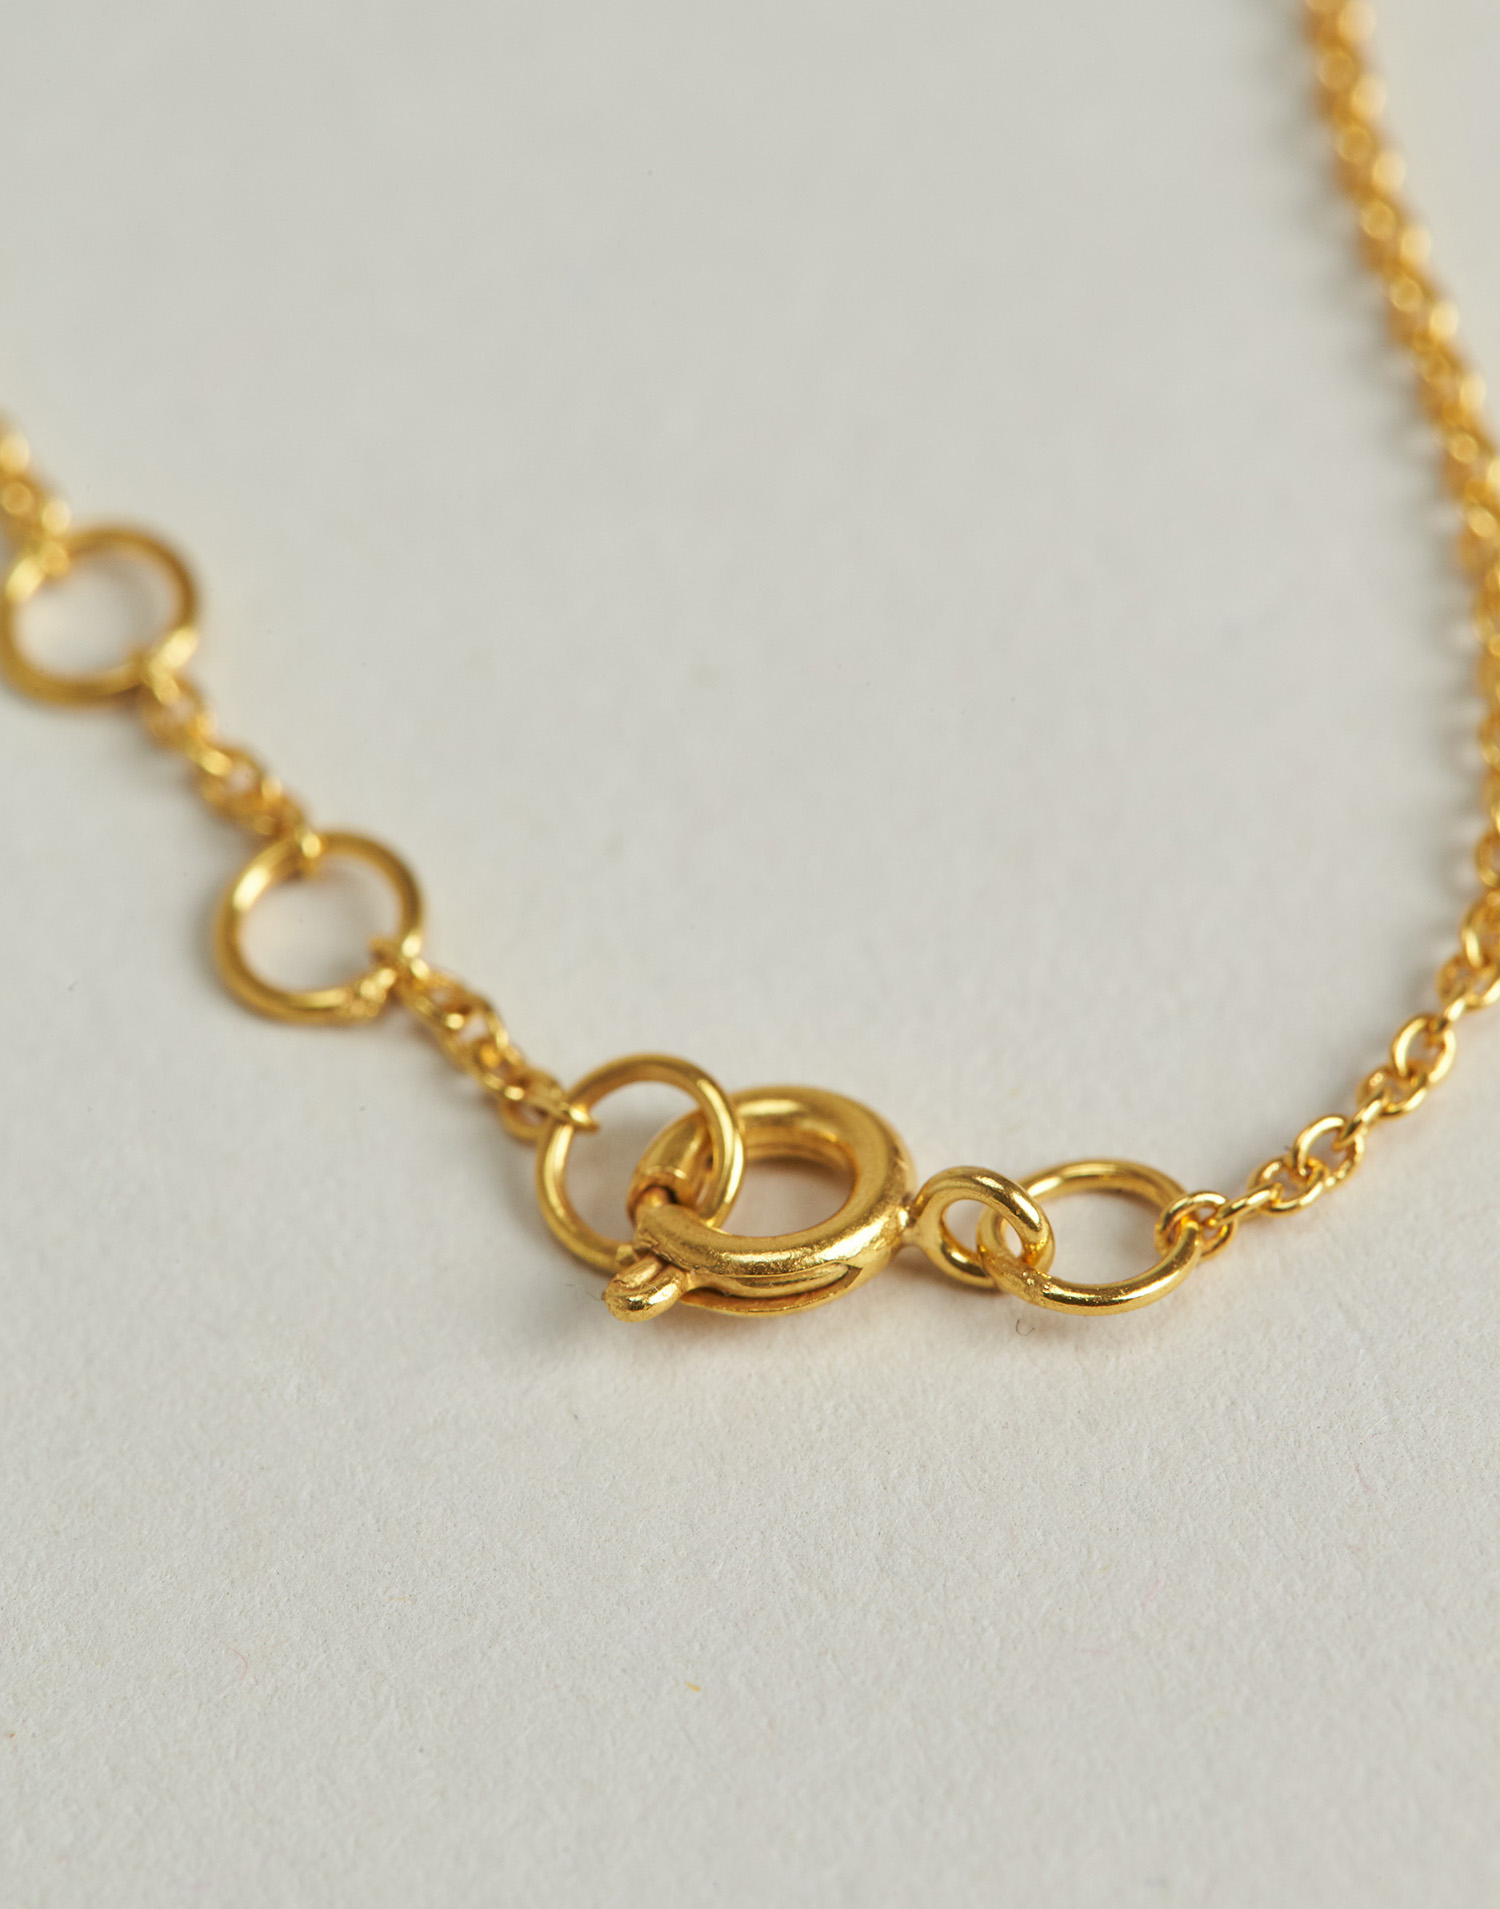 Gilded turquoise bracelet